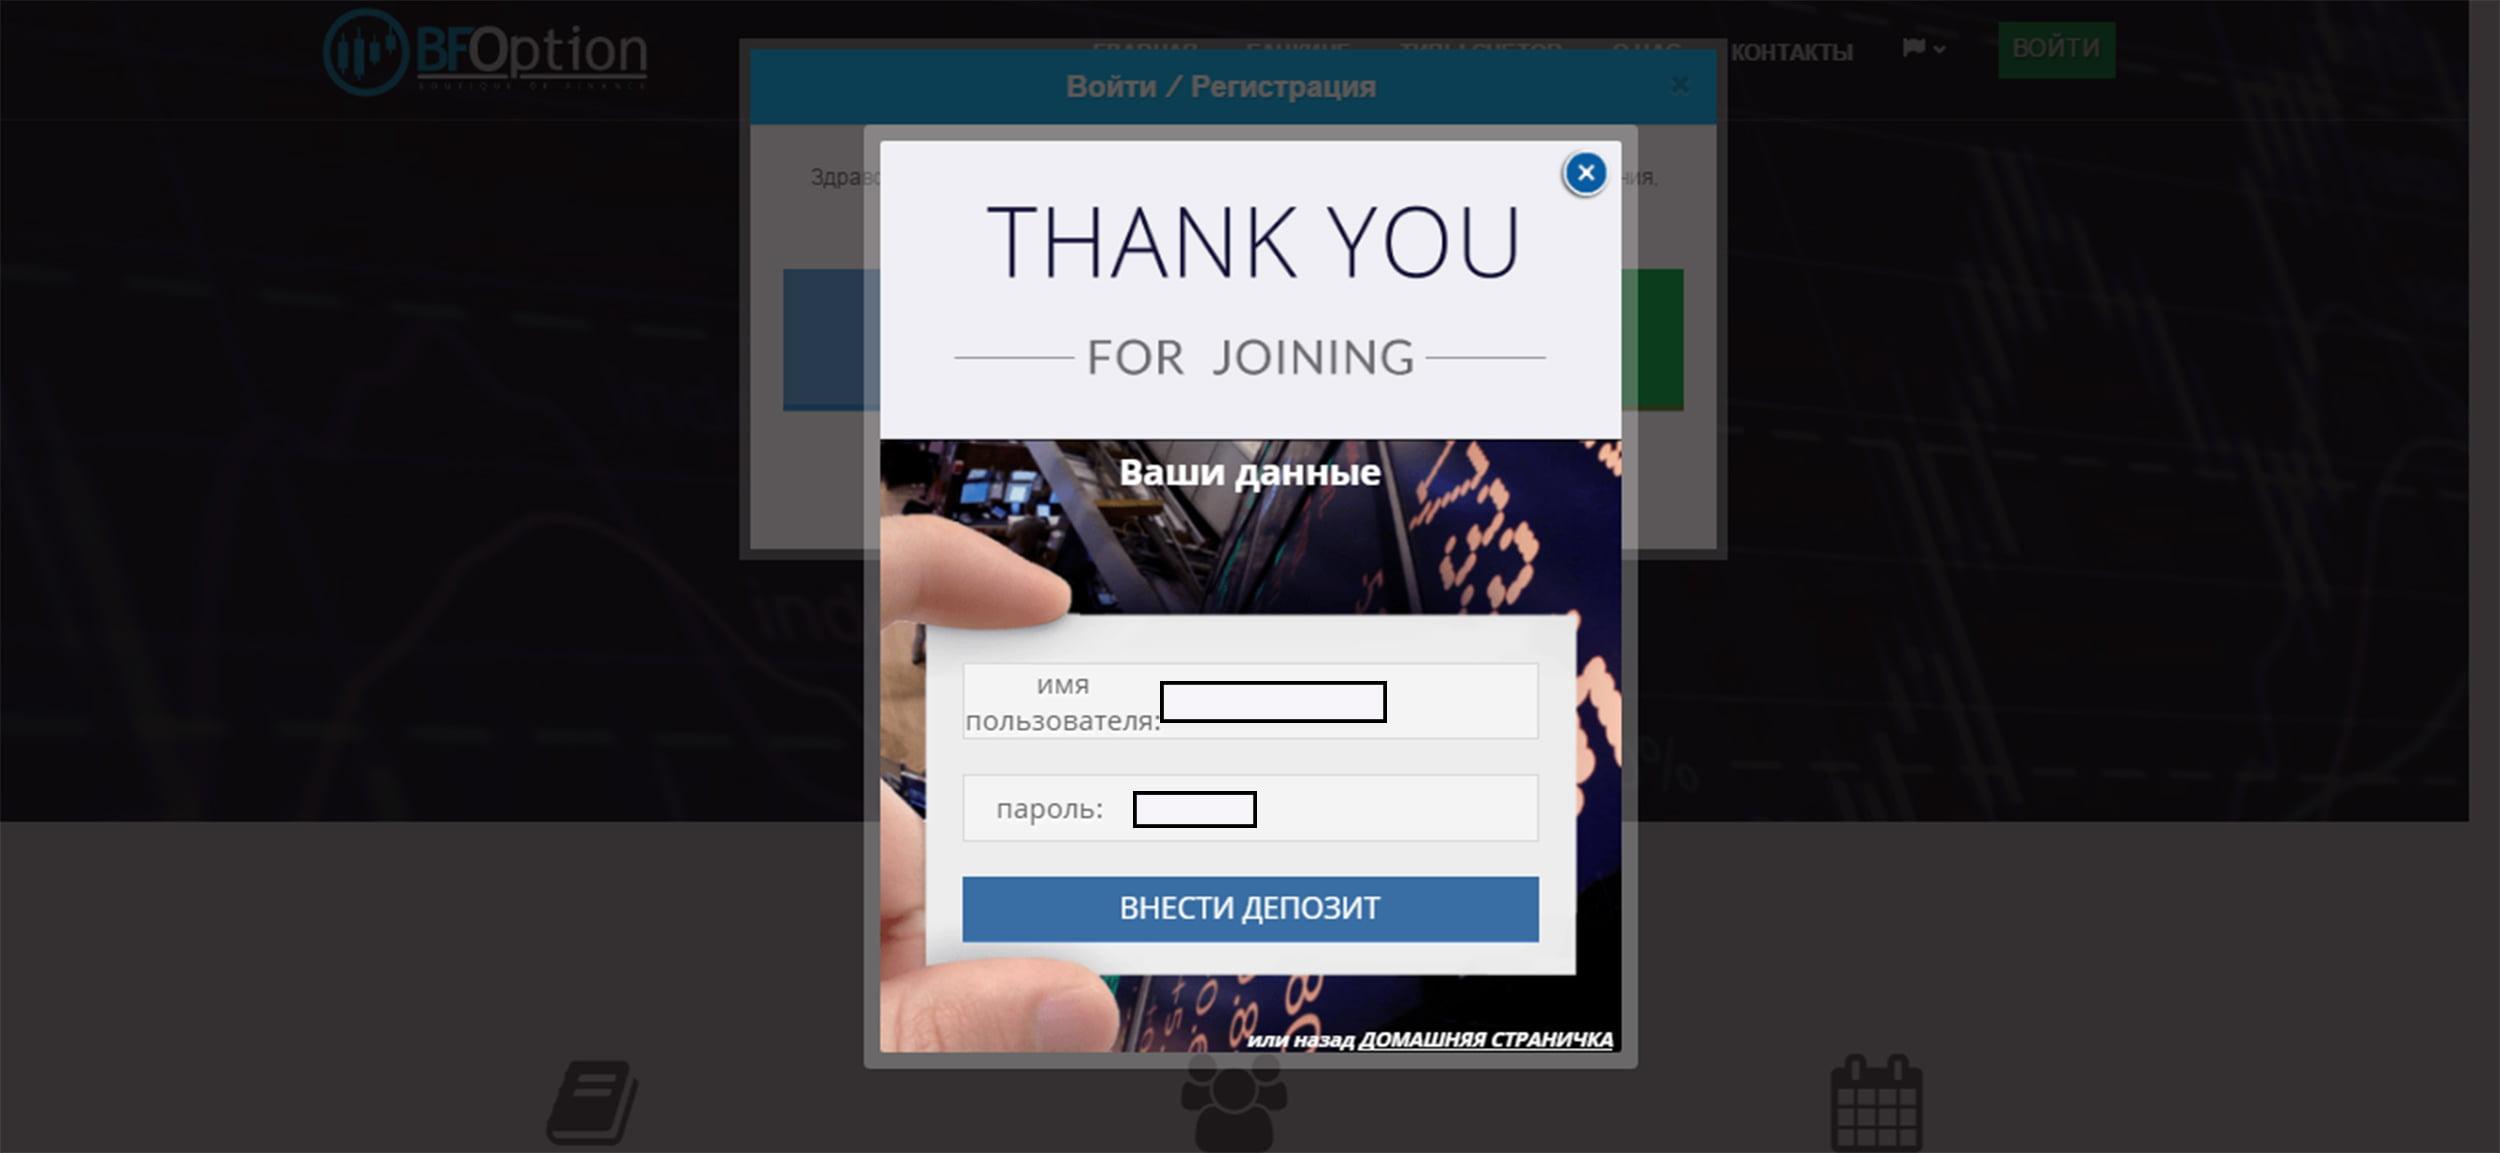 Регистрация на сайте BFOption.com